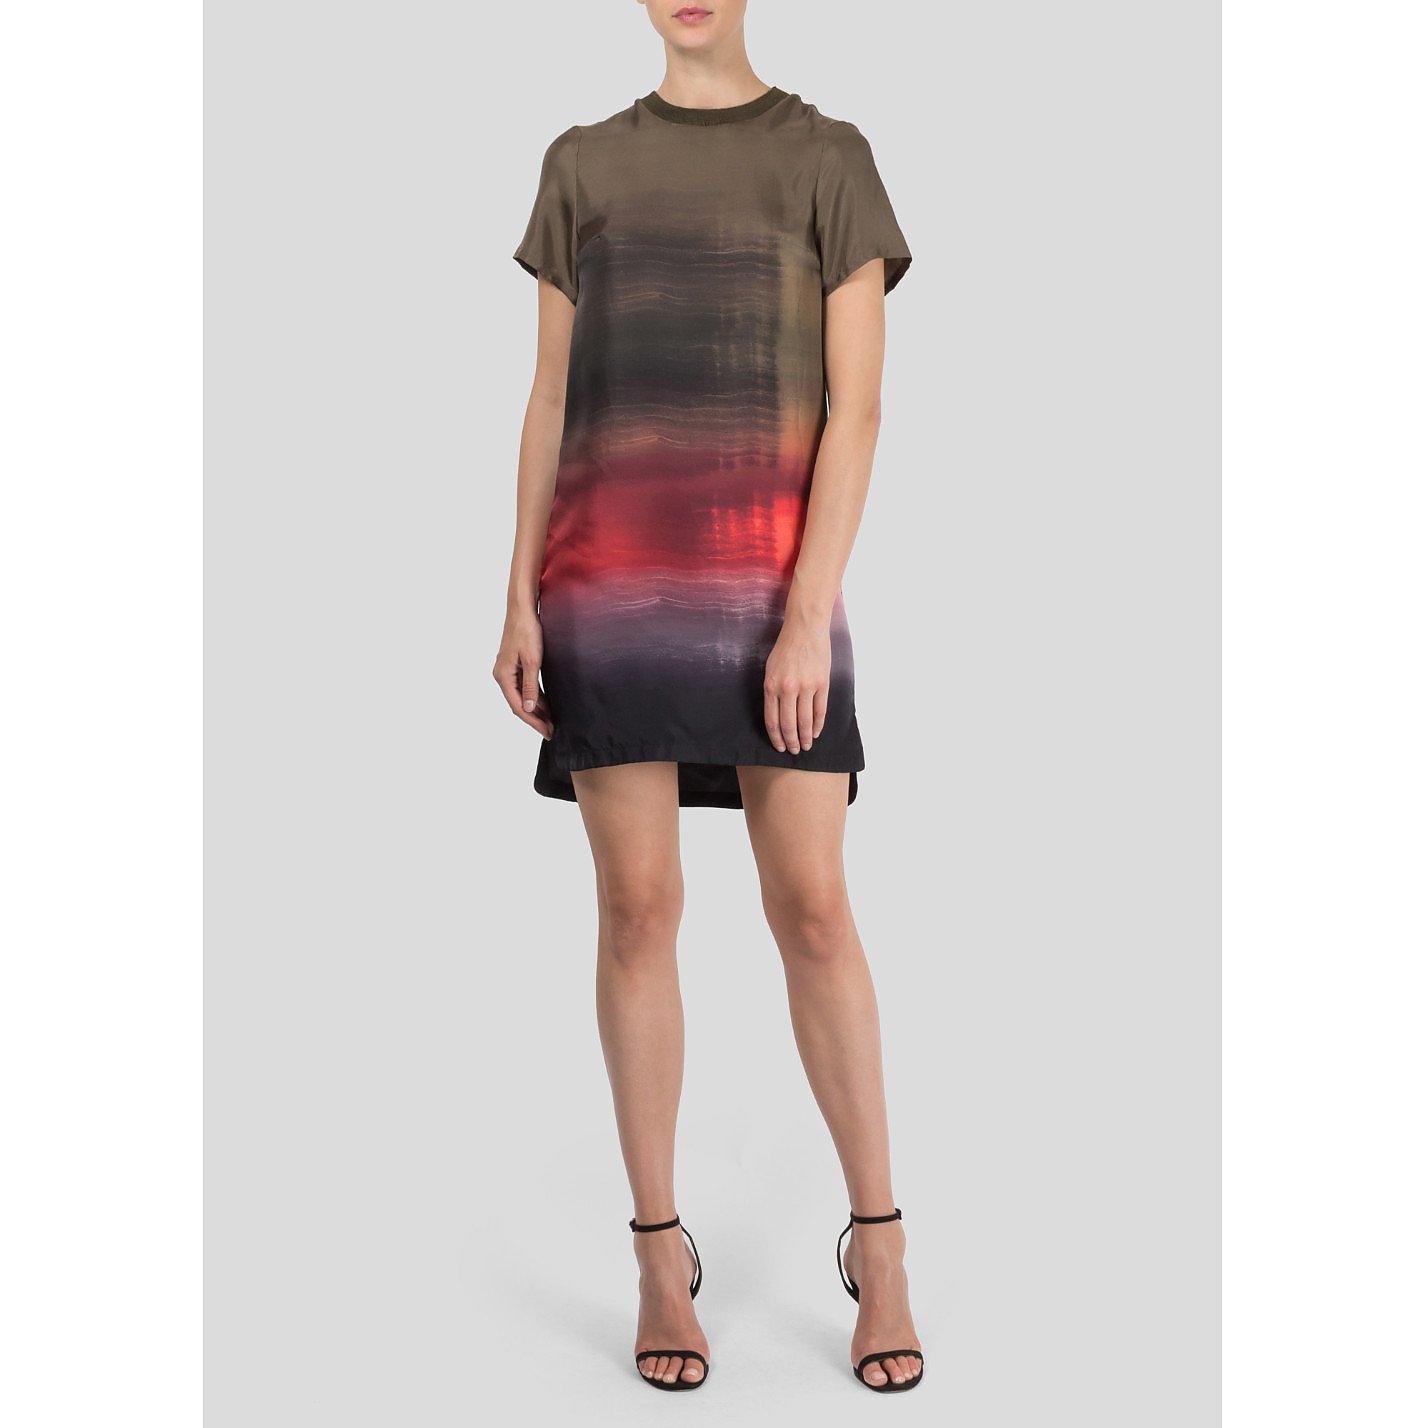 Zoe Jordan Ombre T-Shirt Dress